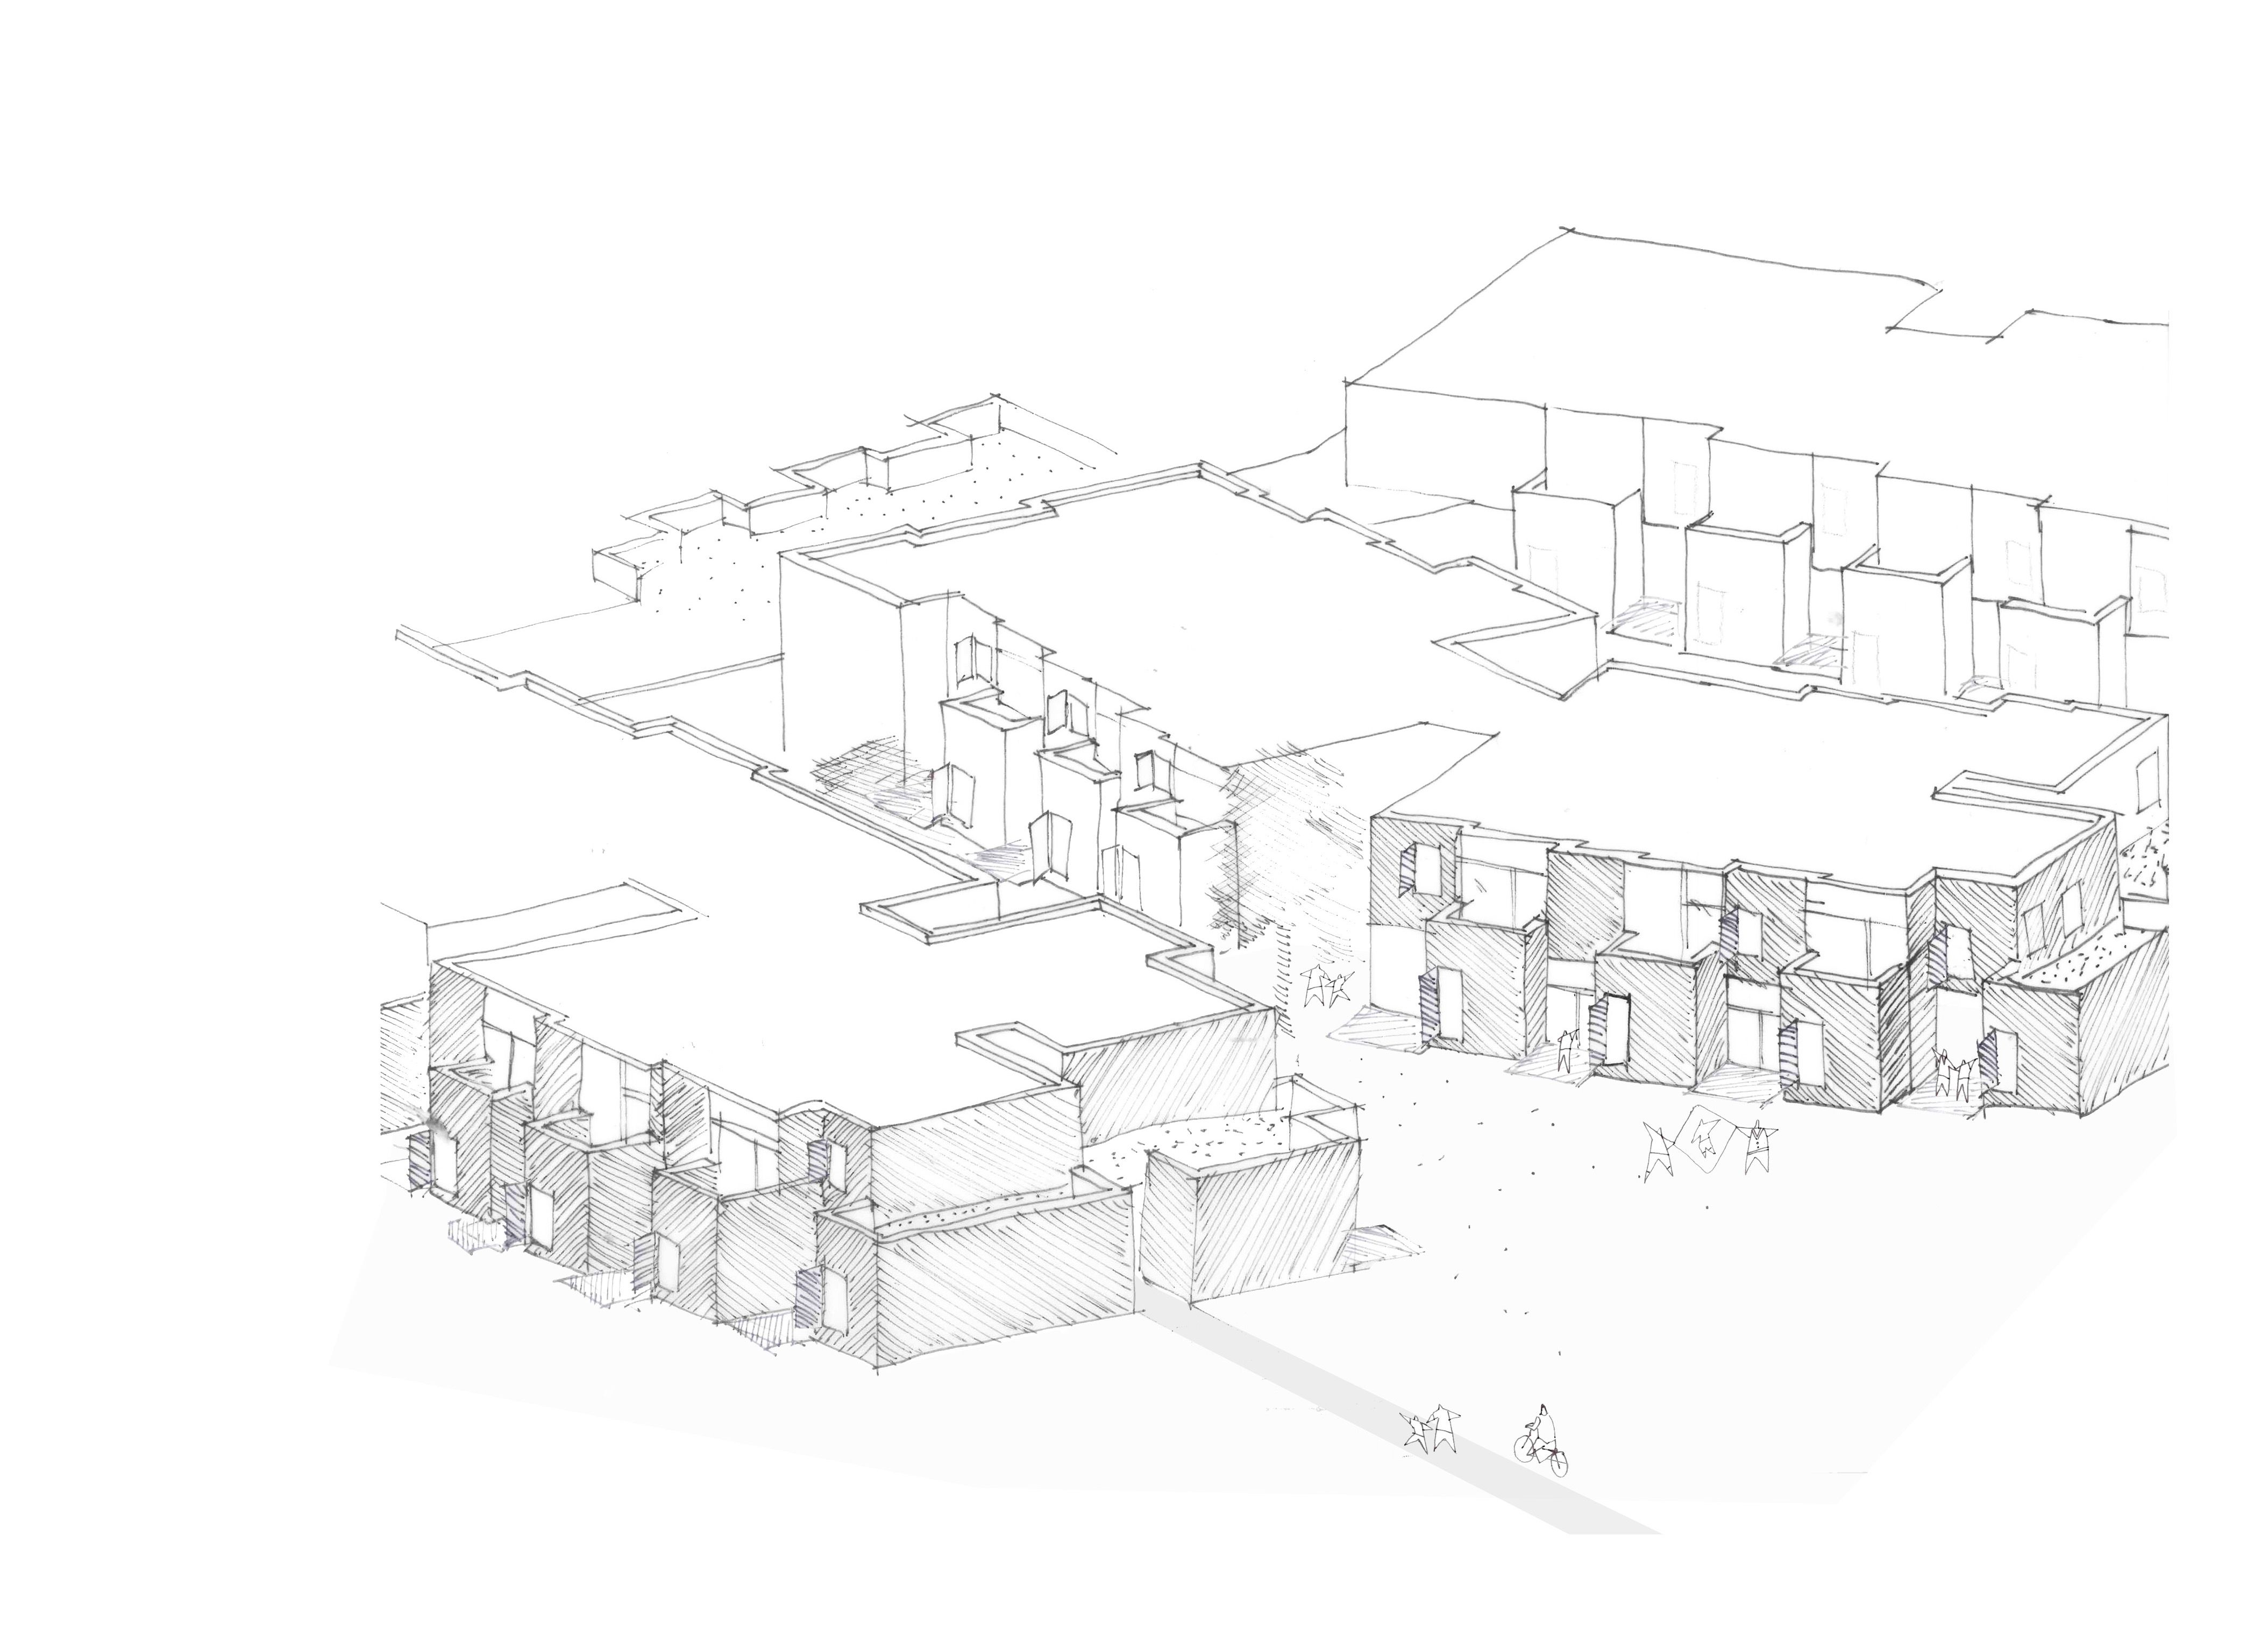 1227MBU uitbreiding van een woonzorgcentrum te malle i.o.v. lava architecten (lp + avd)